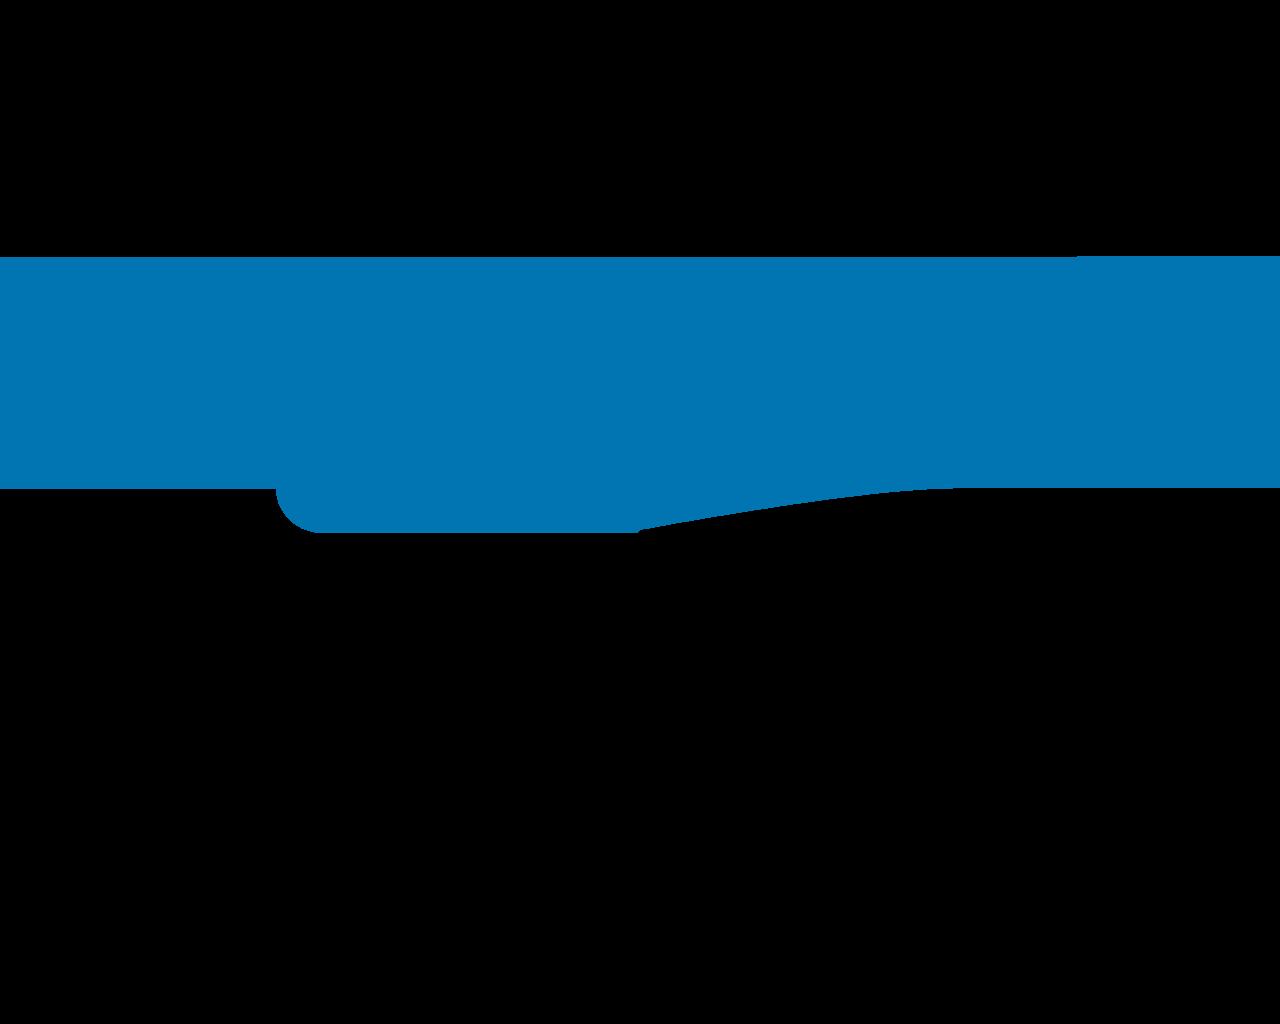 Priority Ordering Logo